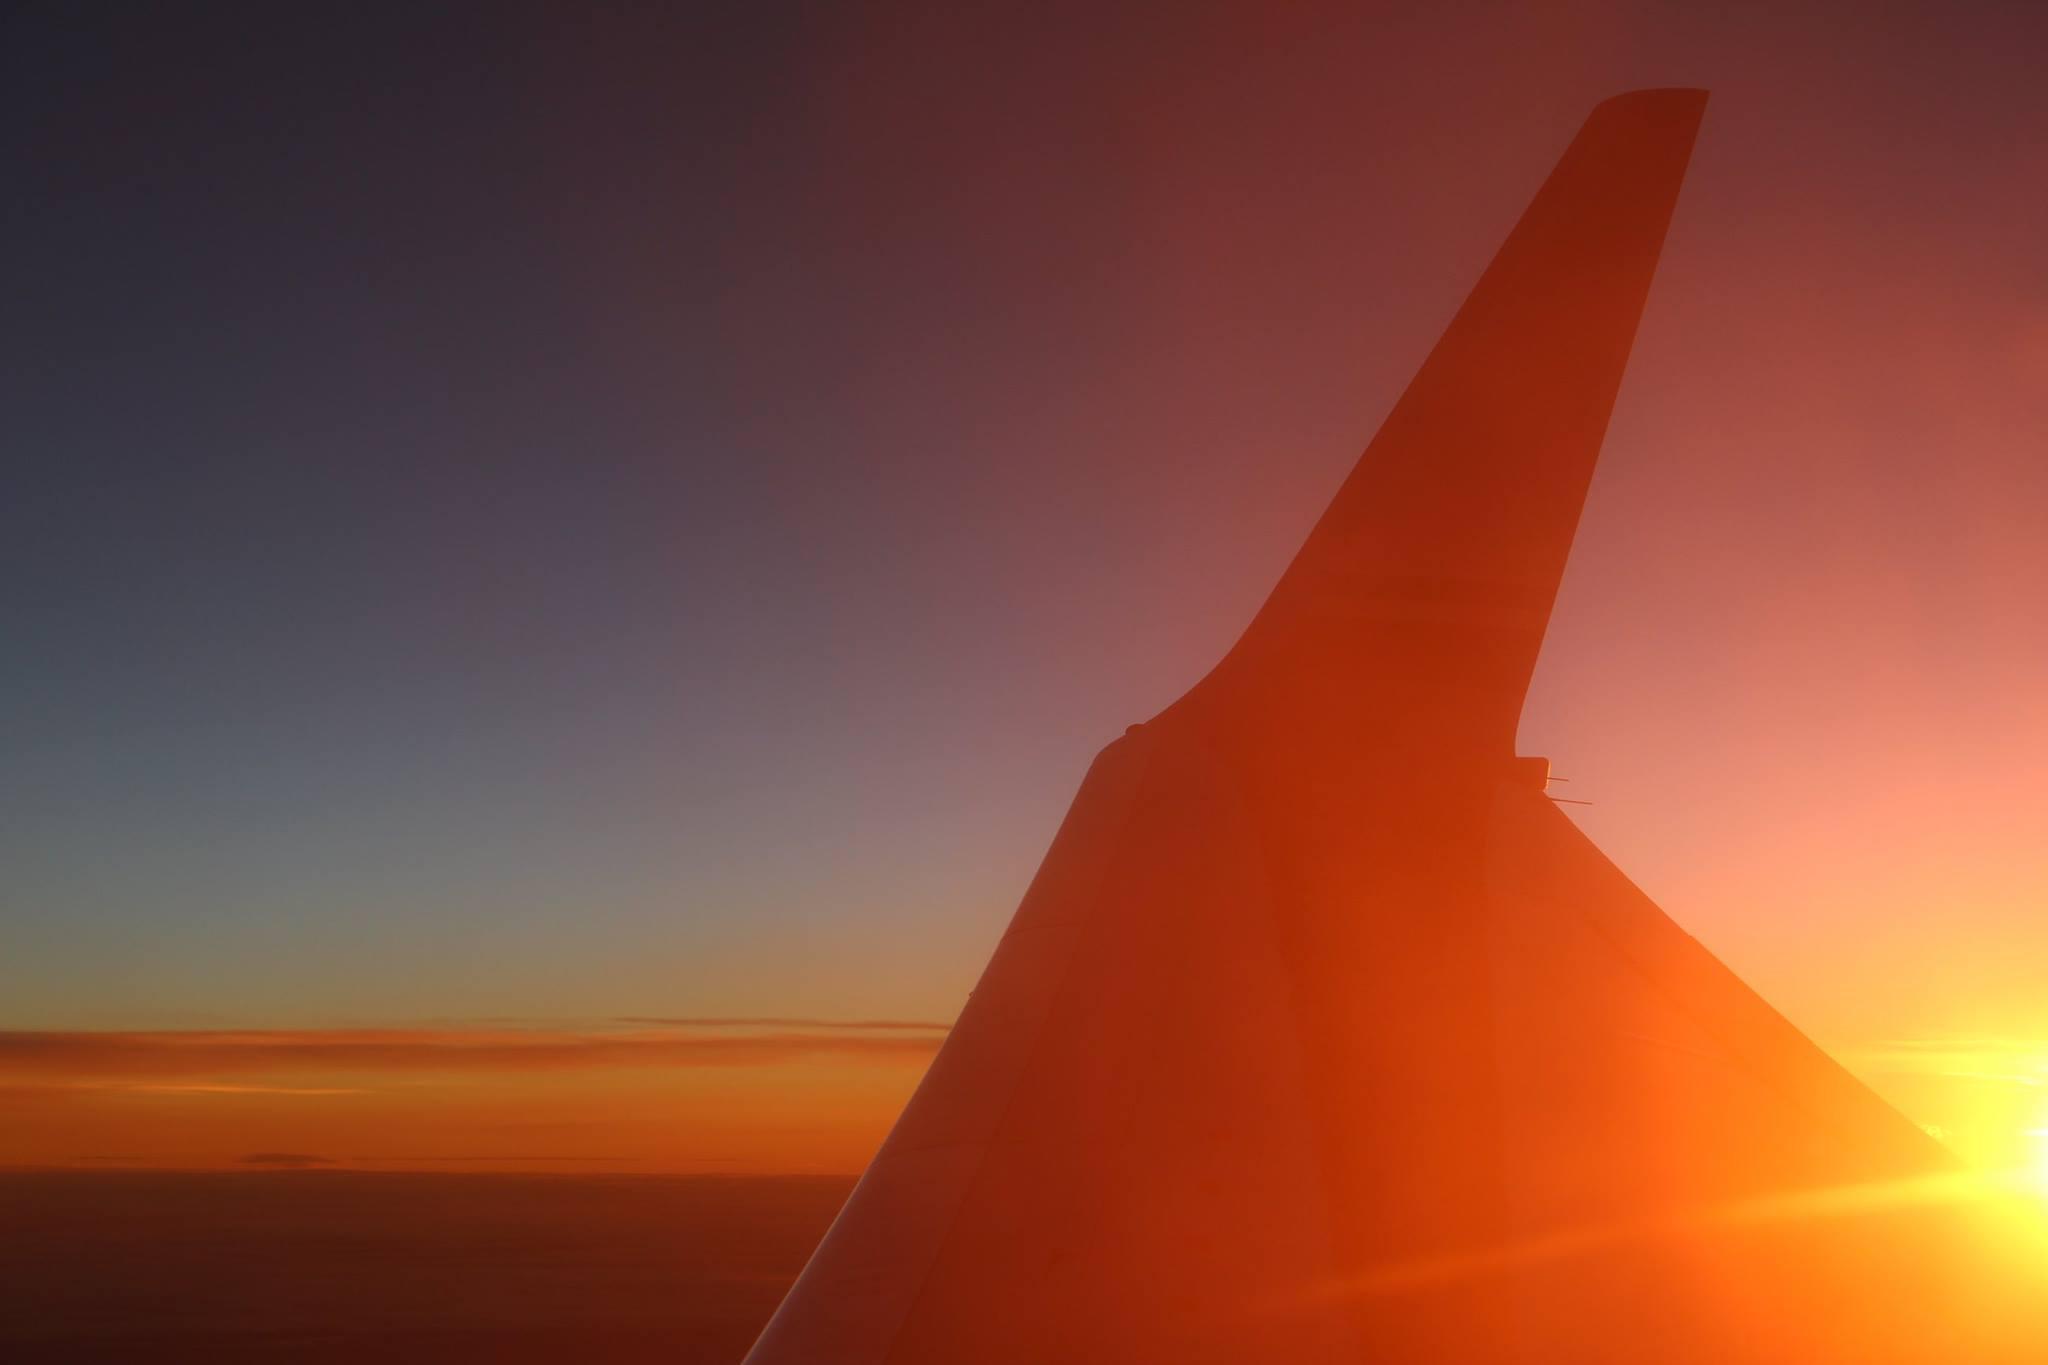 Leaving Japan - the rising sun Yui Sasajima Photography